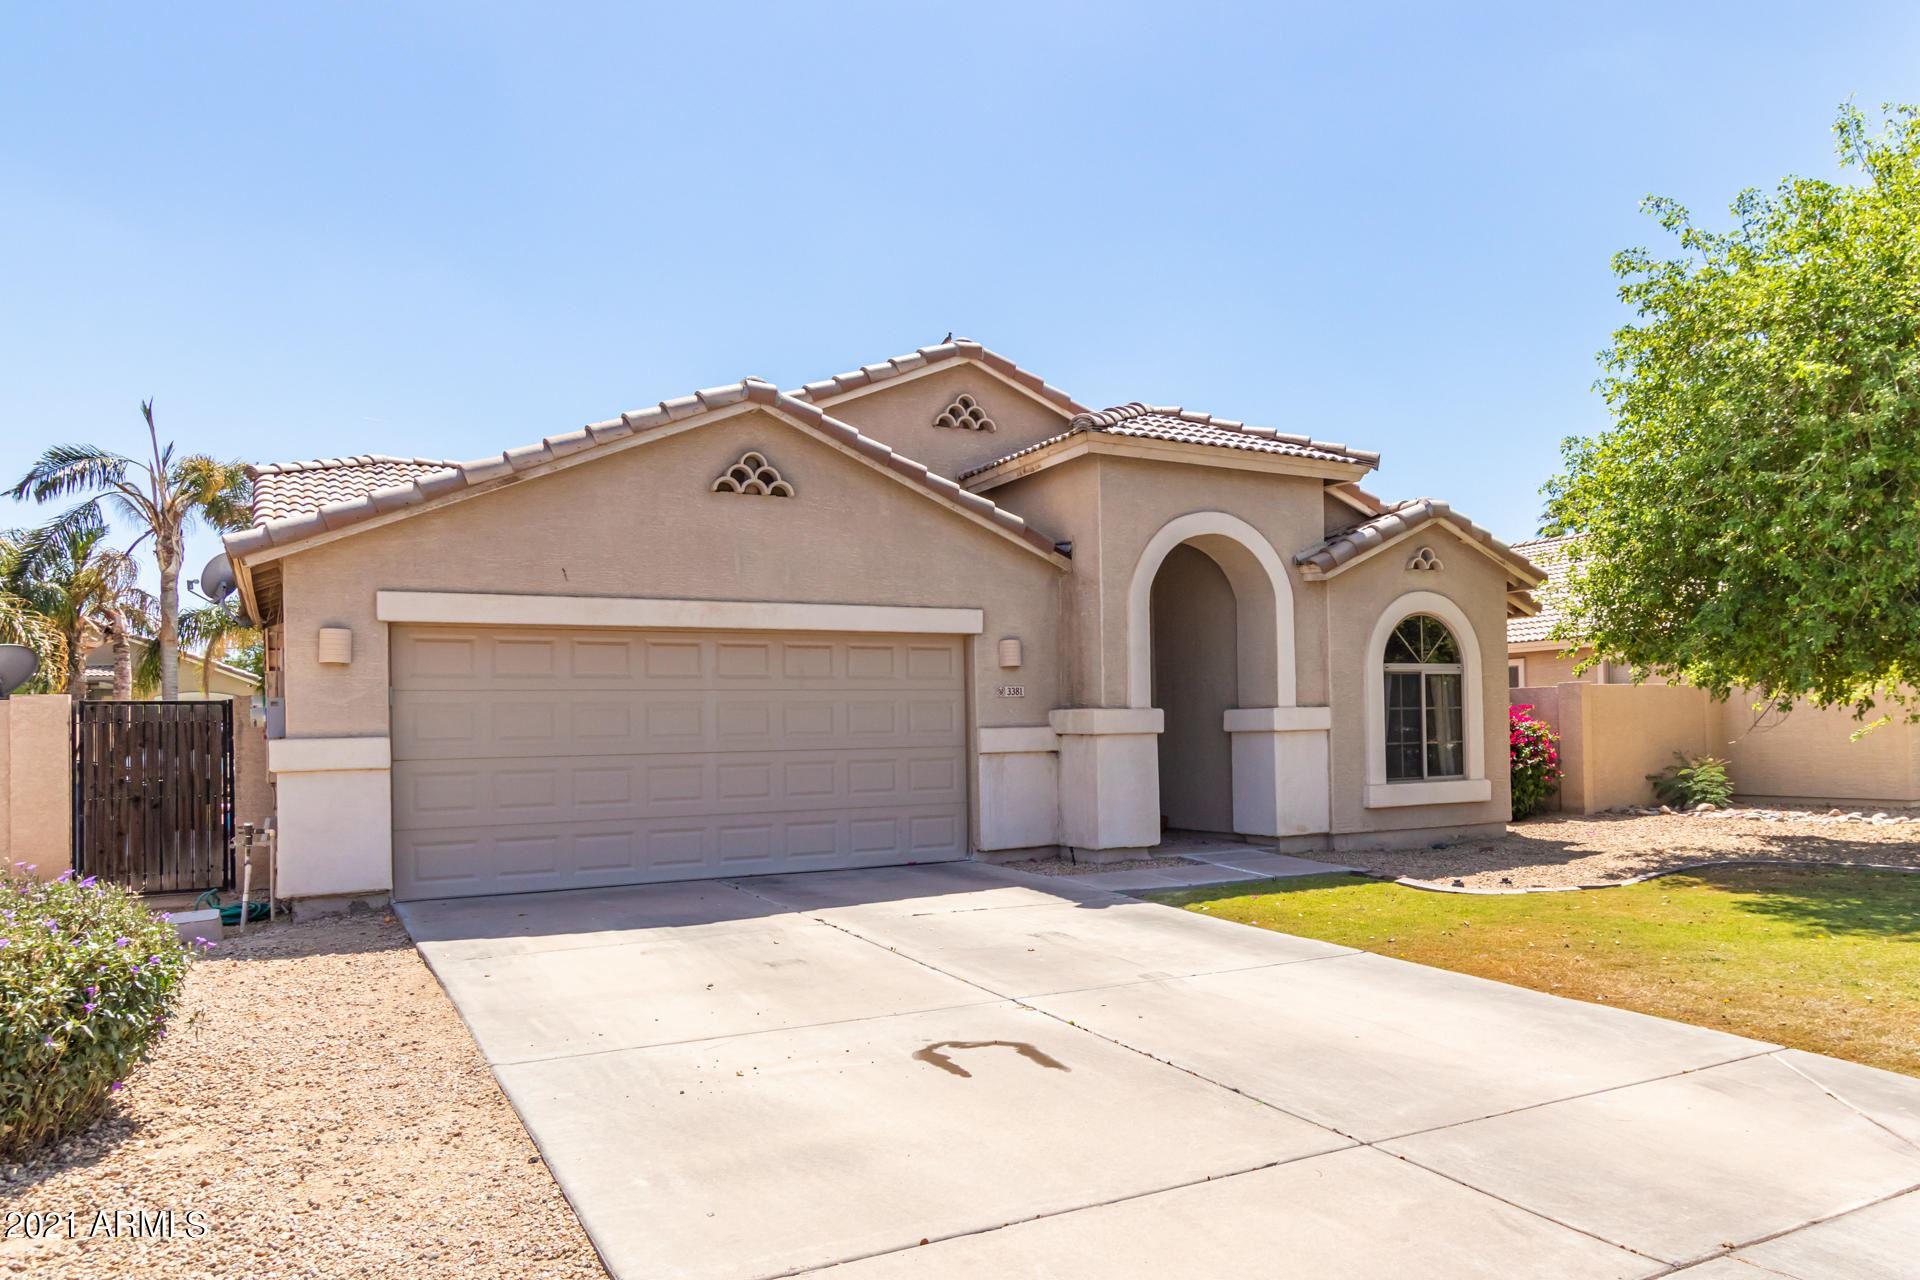 Photo of 3381 E FLAMINGO Court, Gilbert, AZ 85297 (MLS # 6232156)